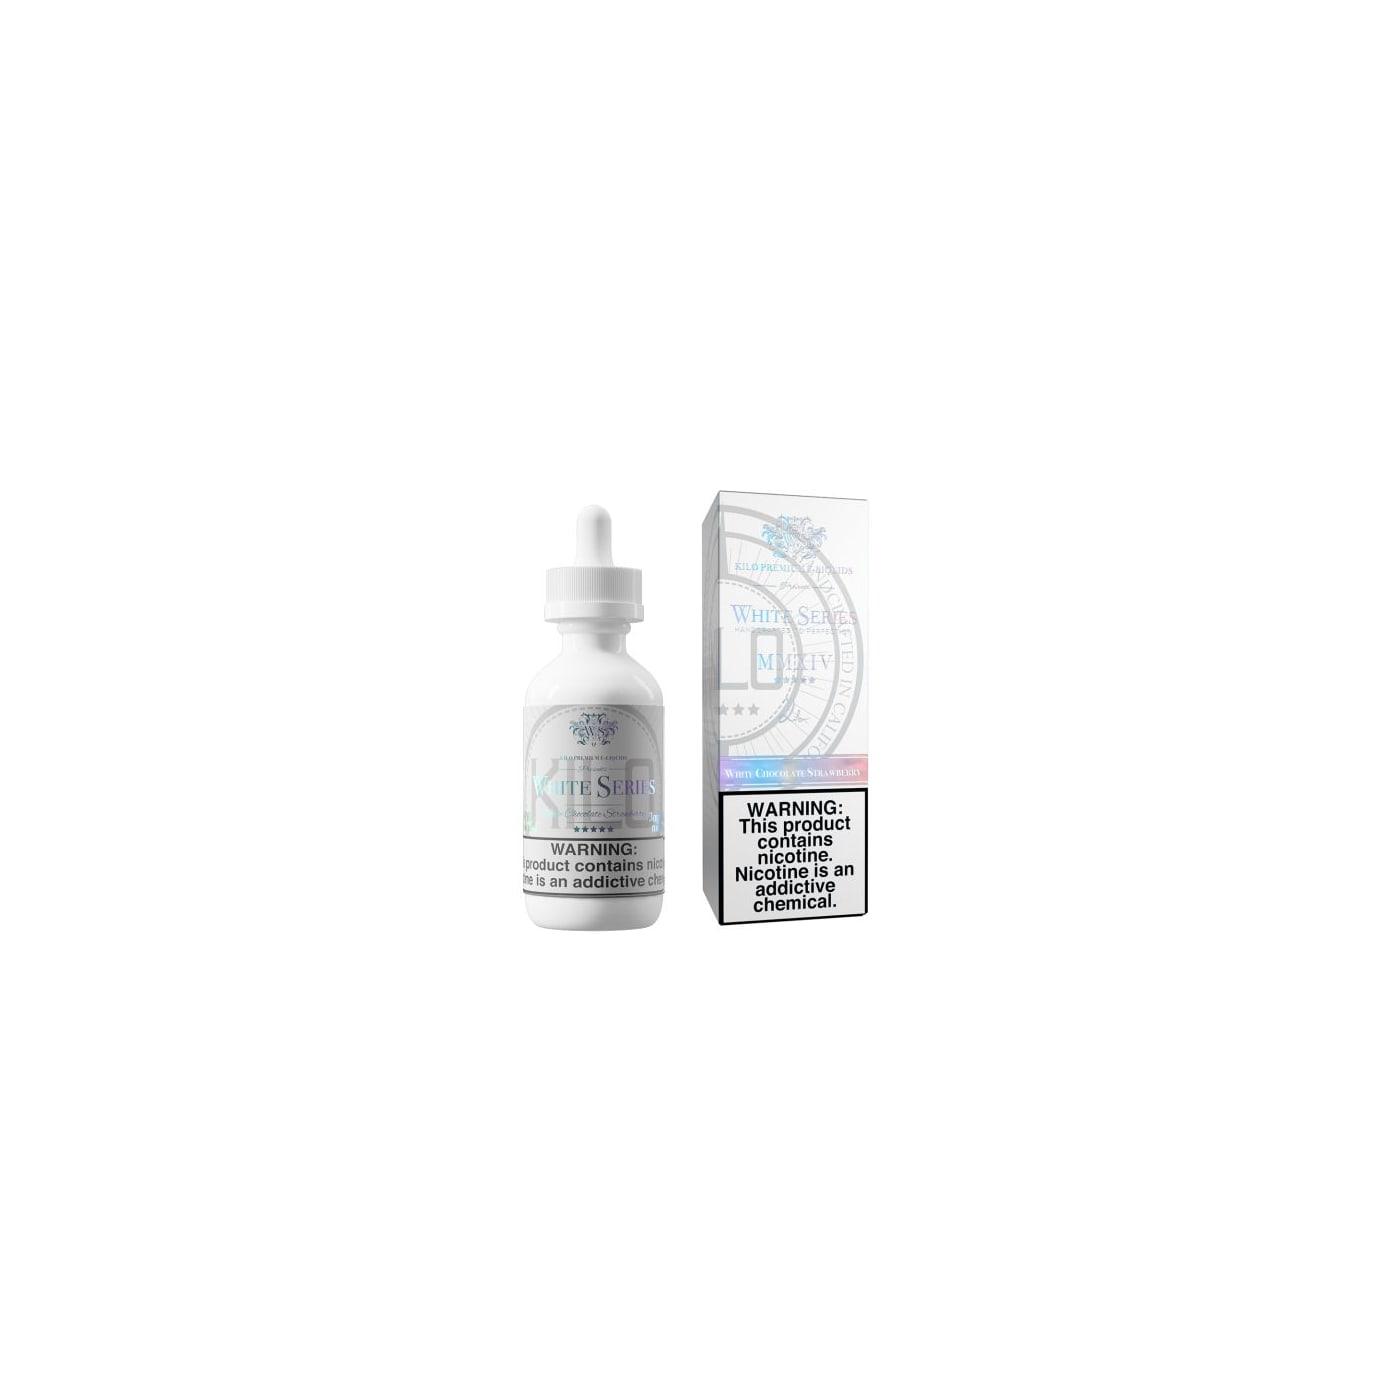 Kilo White Series Vape Juice - White Chocolate Strawberry E-Liquid